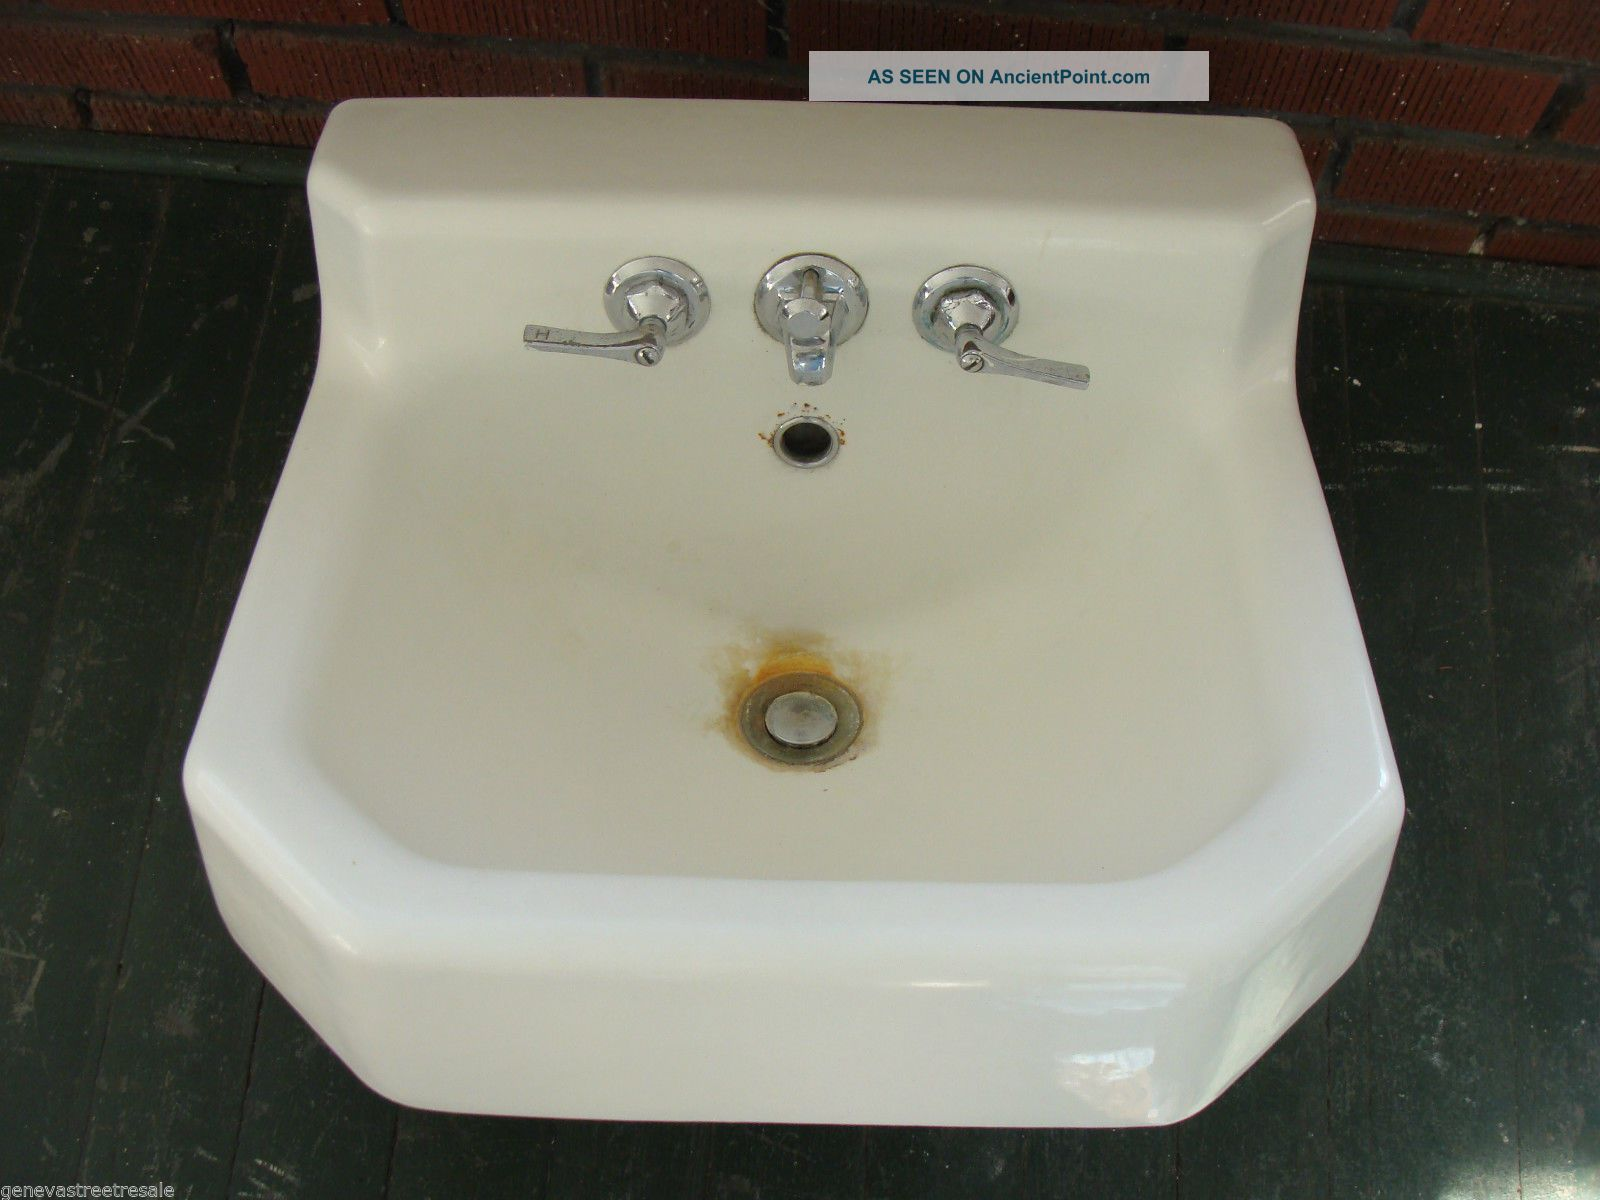 Vintage 1950s Kohler White Cast Iron Porcelain Sink Bathroom Plumbing Sinks photo